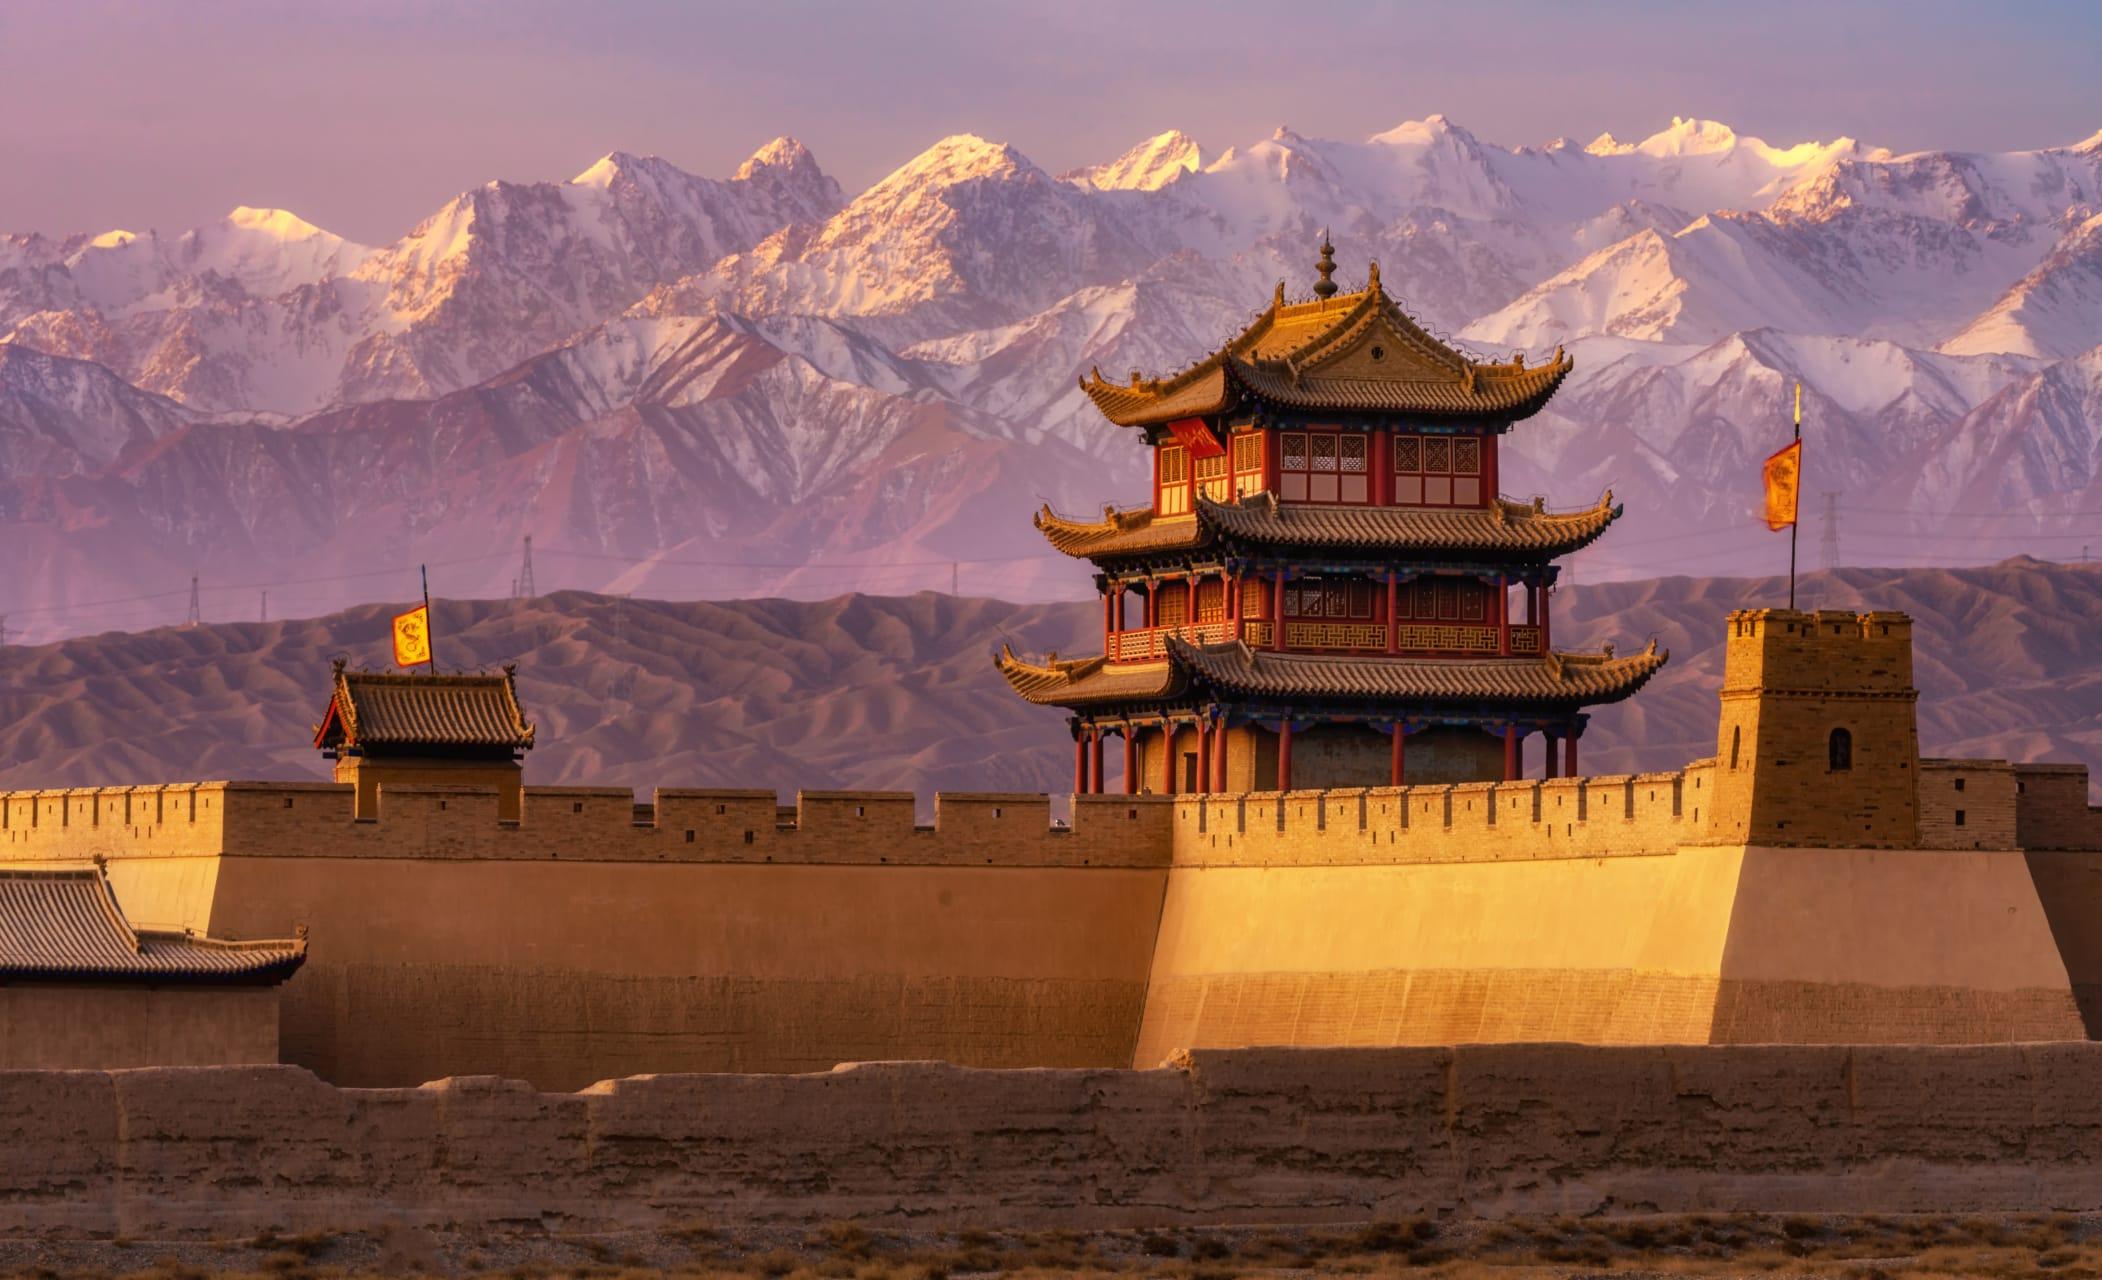 Hexi Corridor (China's Silk Road) - Jiayuguan Fortress: The Ming-period Great Wall Silk Road Protector